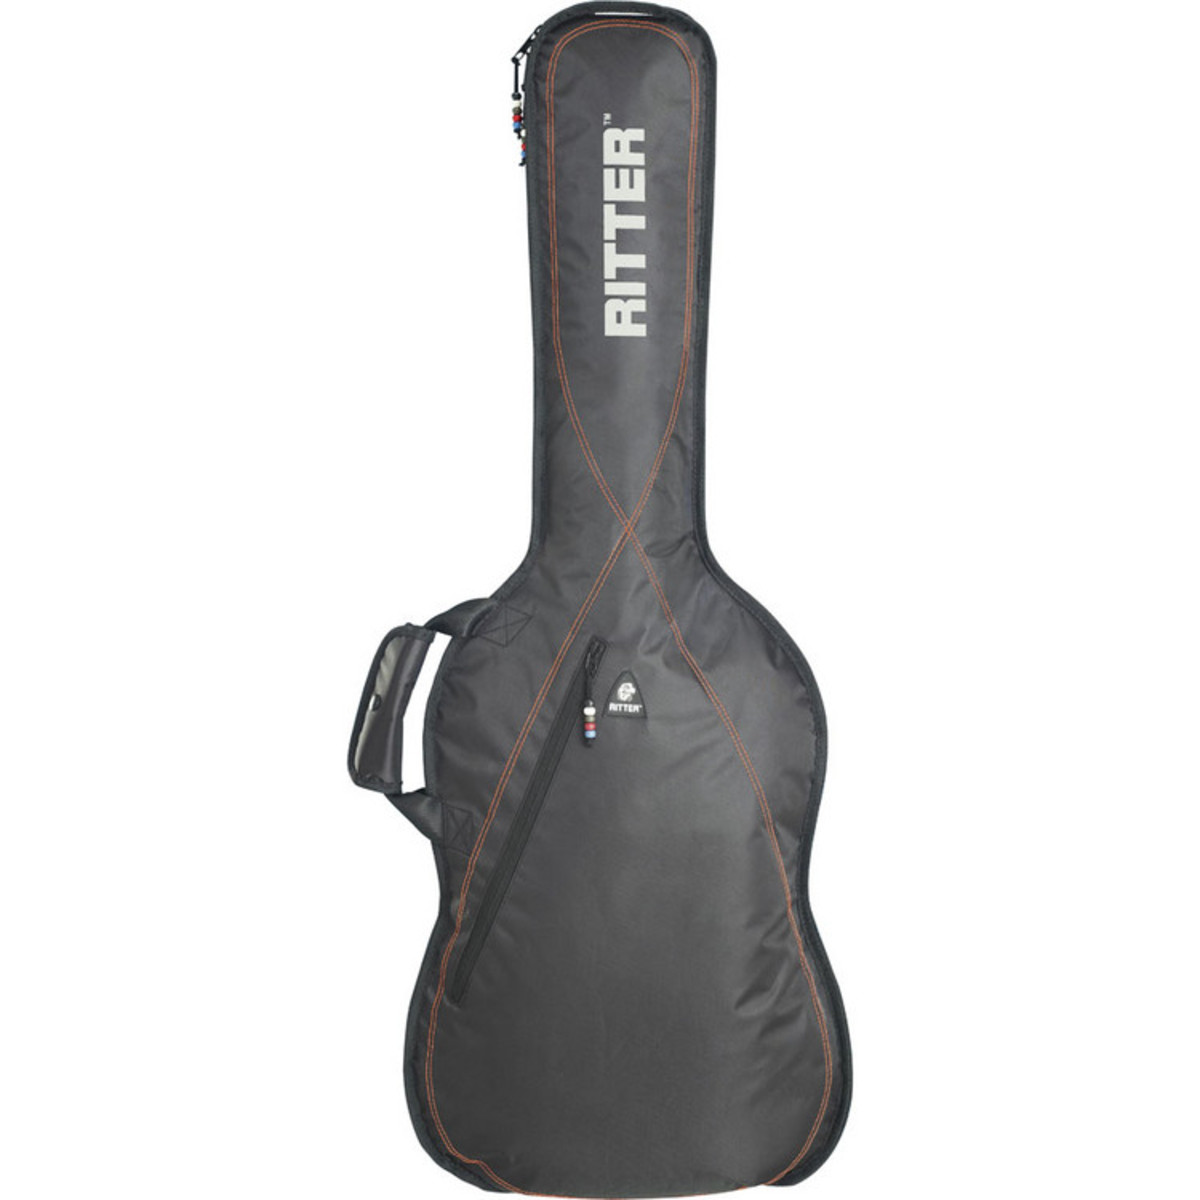 disc ritter performance rgp2 guitar bag classical 3 4 black red gear4music. Black Bedroom Furniture Sets. Home Design Ideas